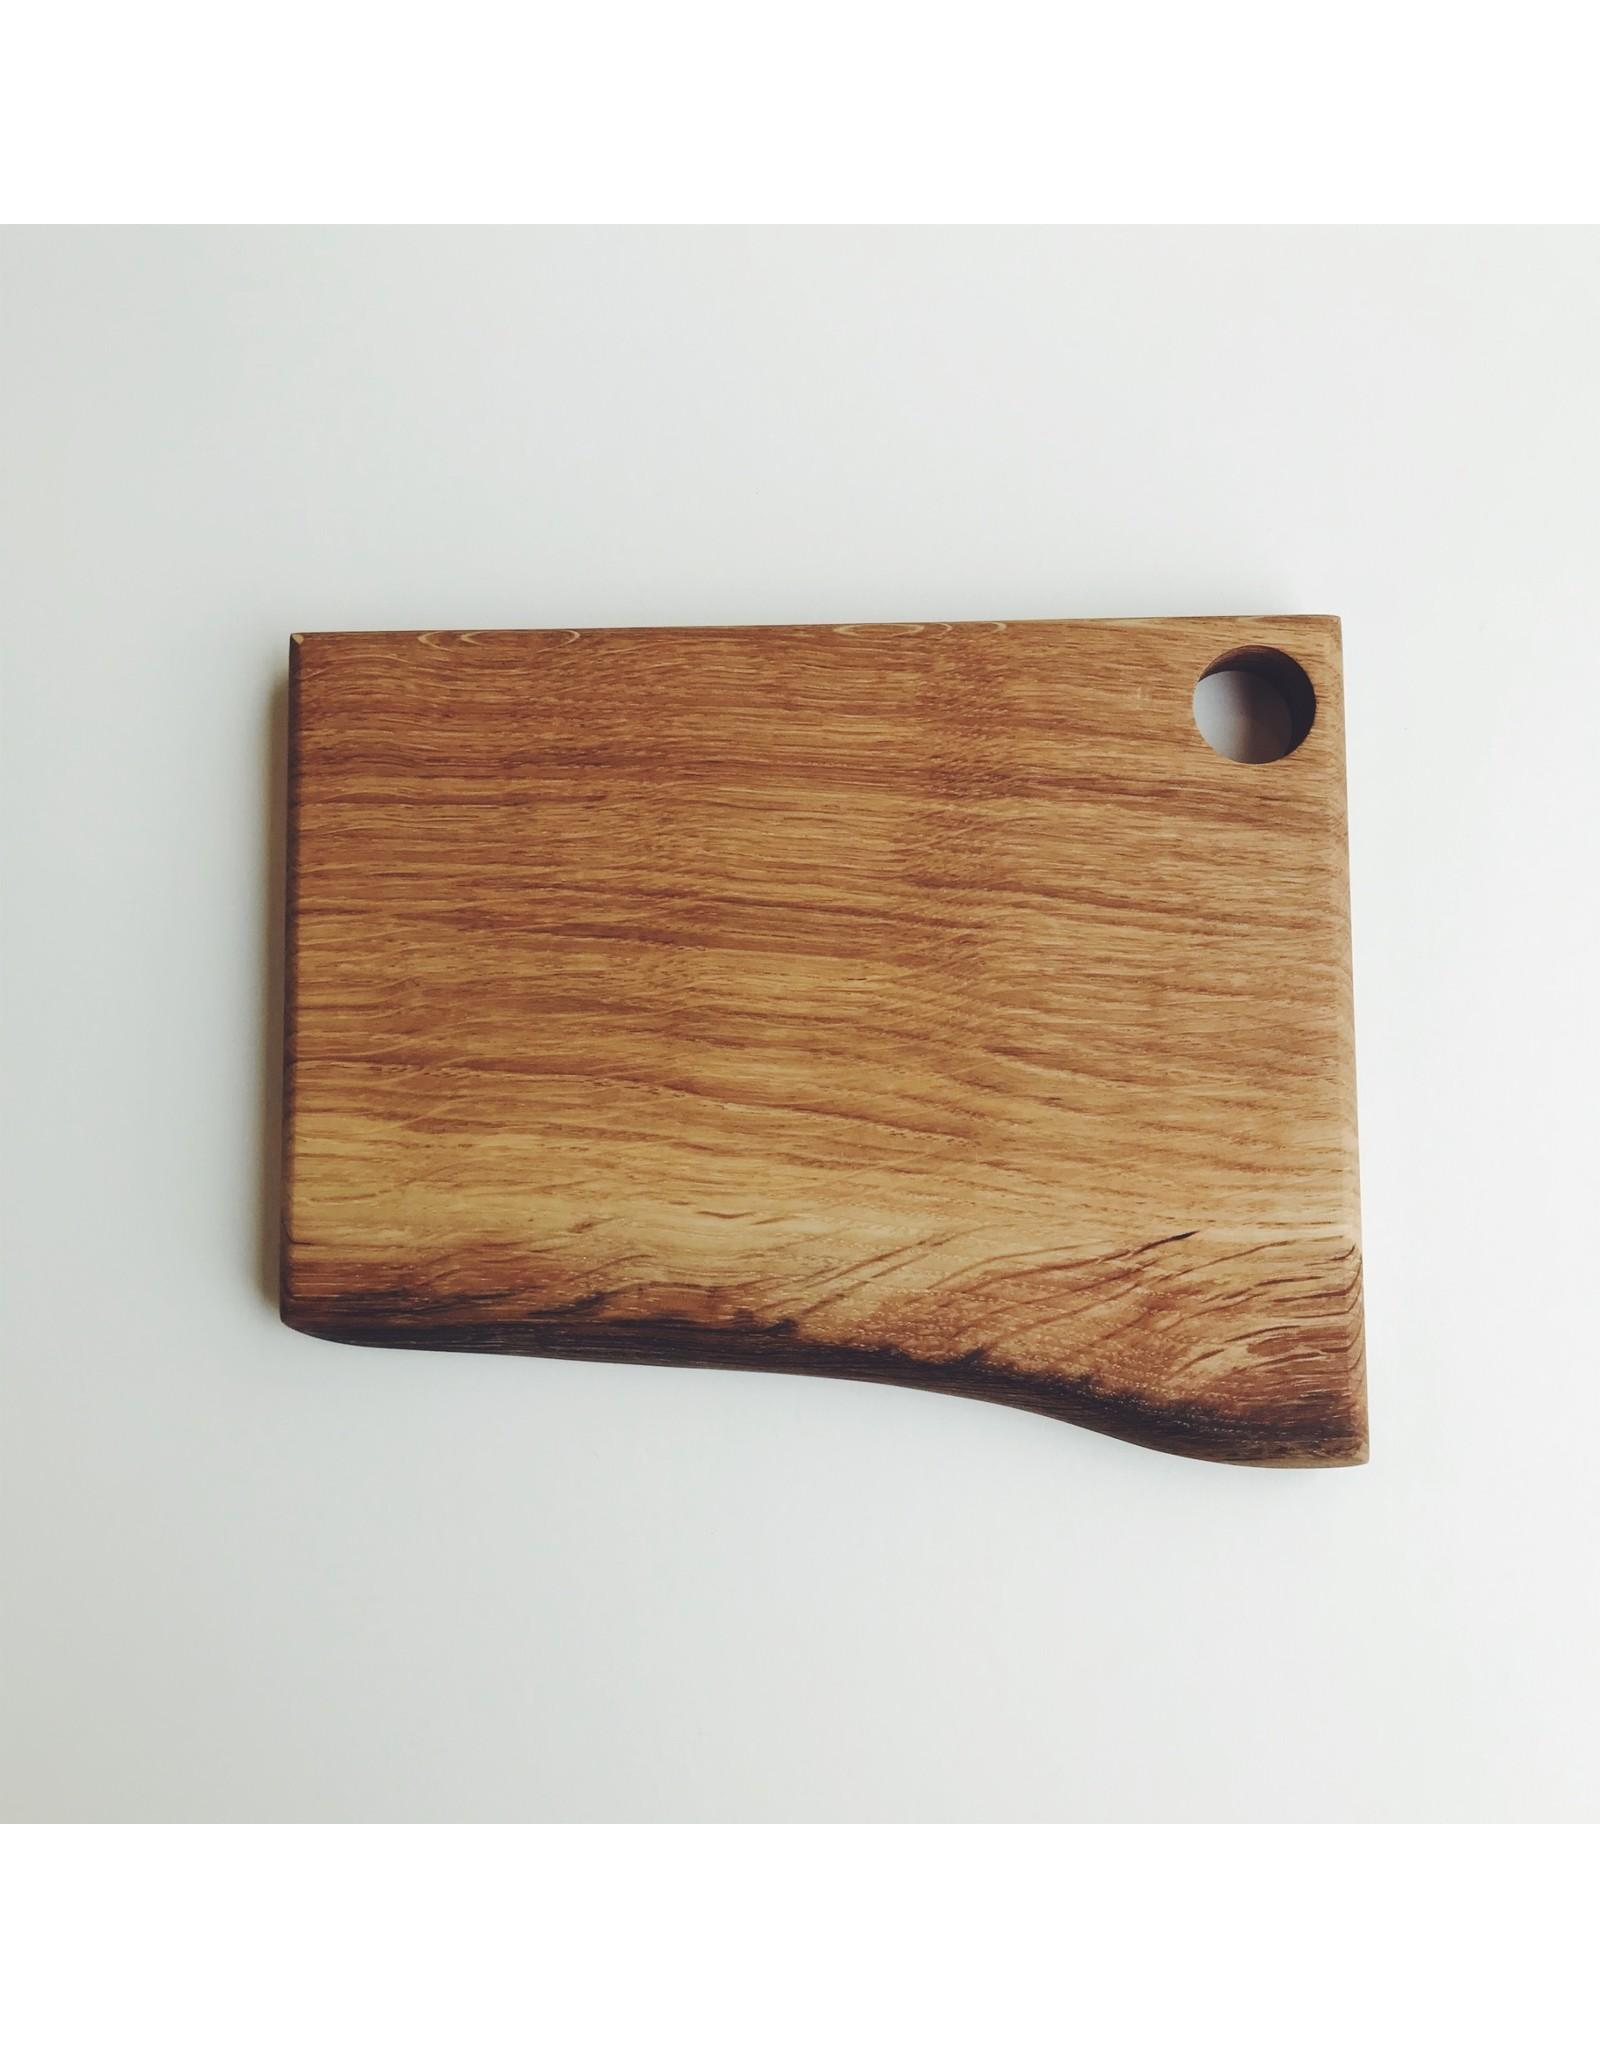 Waney Edge Chopping Board